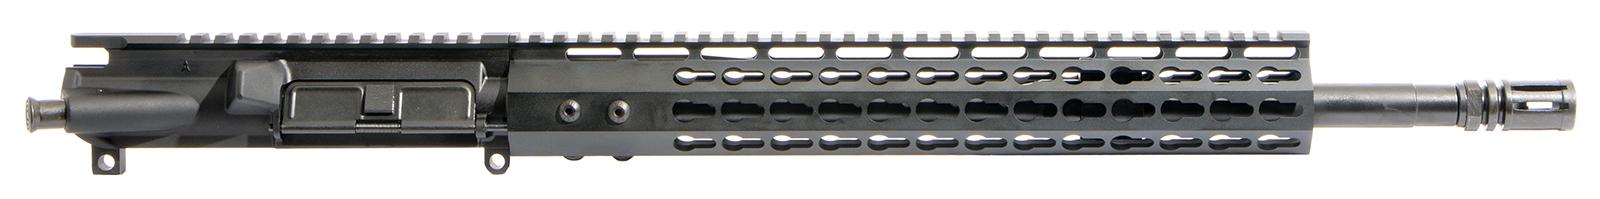 ar-15-upper-assembly-16-5-56x45-1-7-midlength-13-cbc-gen-2-keymod-gen-2-ar-15-handguard-rail